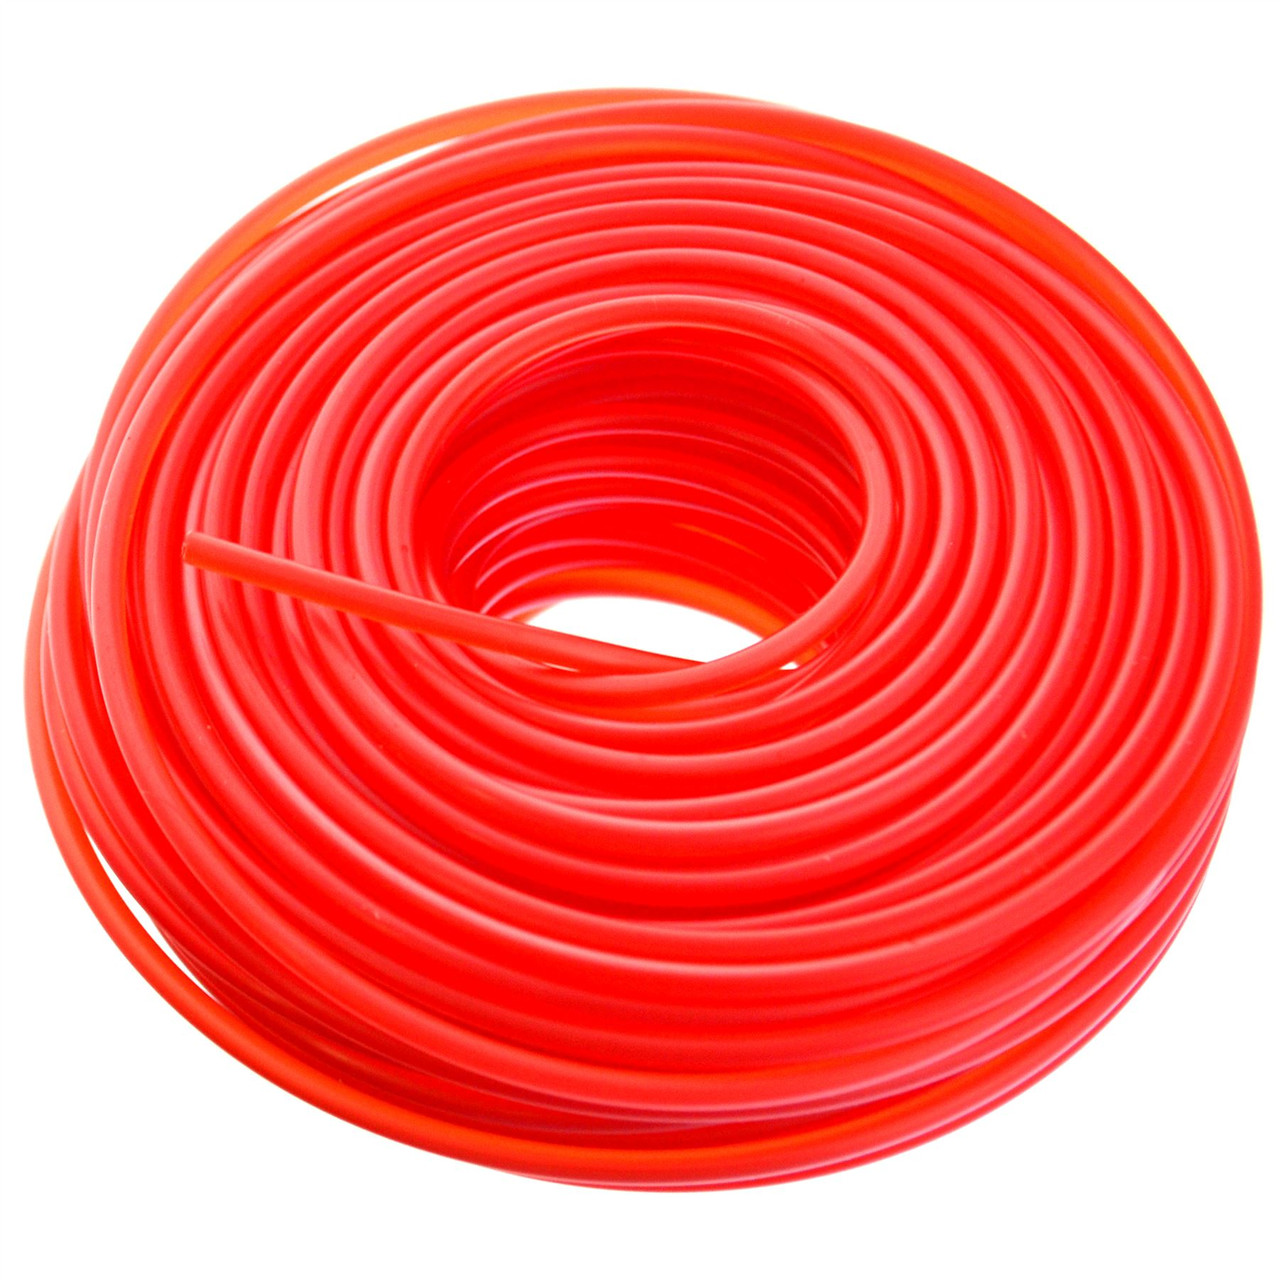 2 4mm x 20m Nylon Strimmer Line Cord Spoof Refill Wire Line Trim Line GAR60